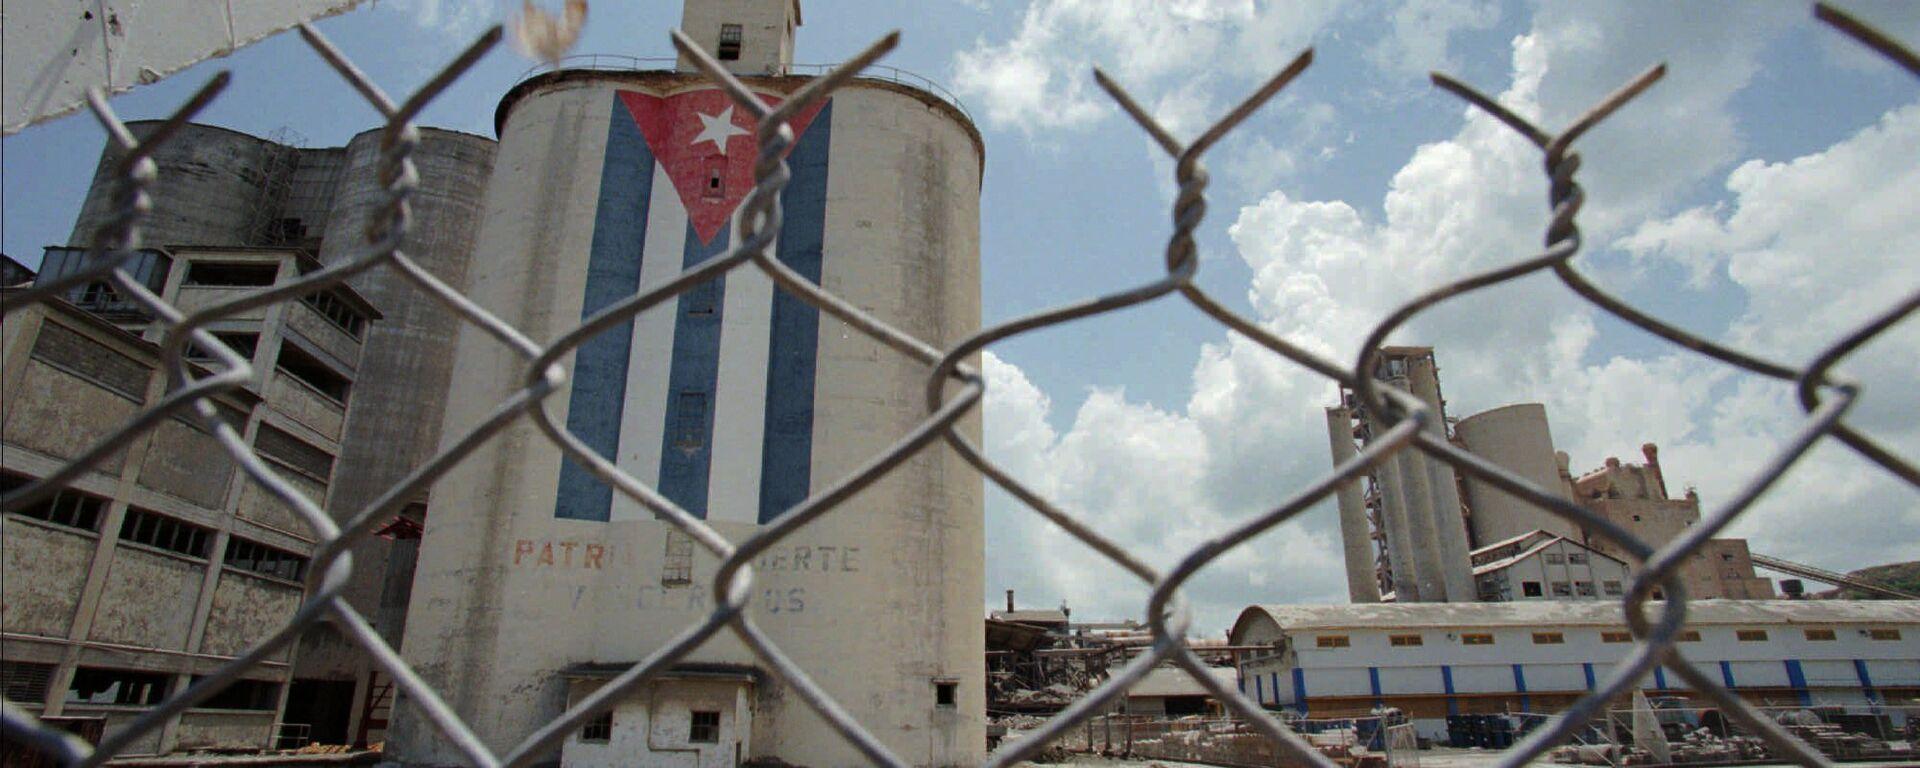 Bandera de Cuba - Sputnik Mundo, 1920, 15.07.2021